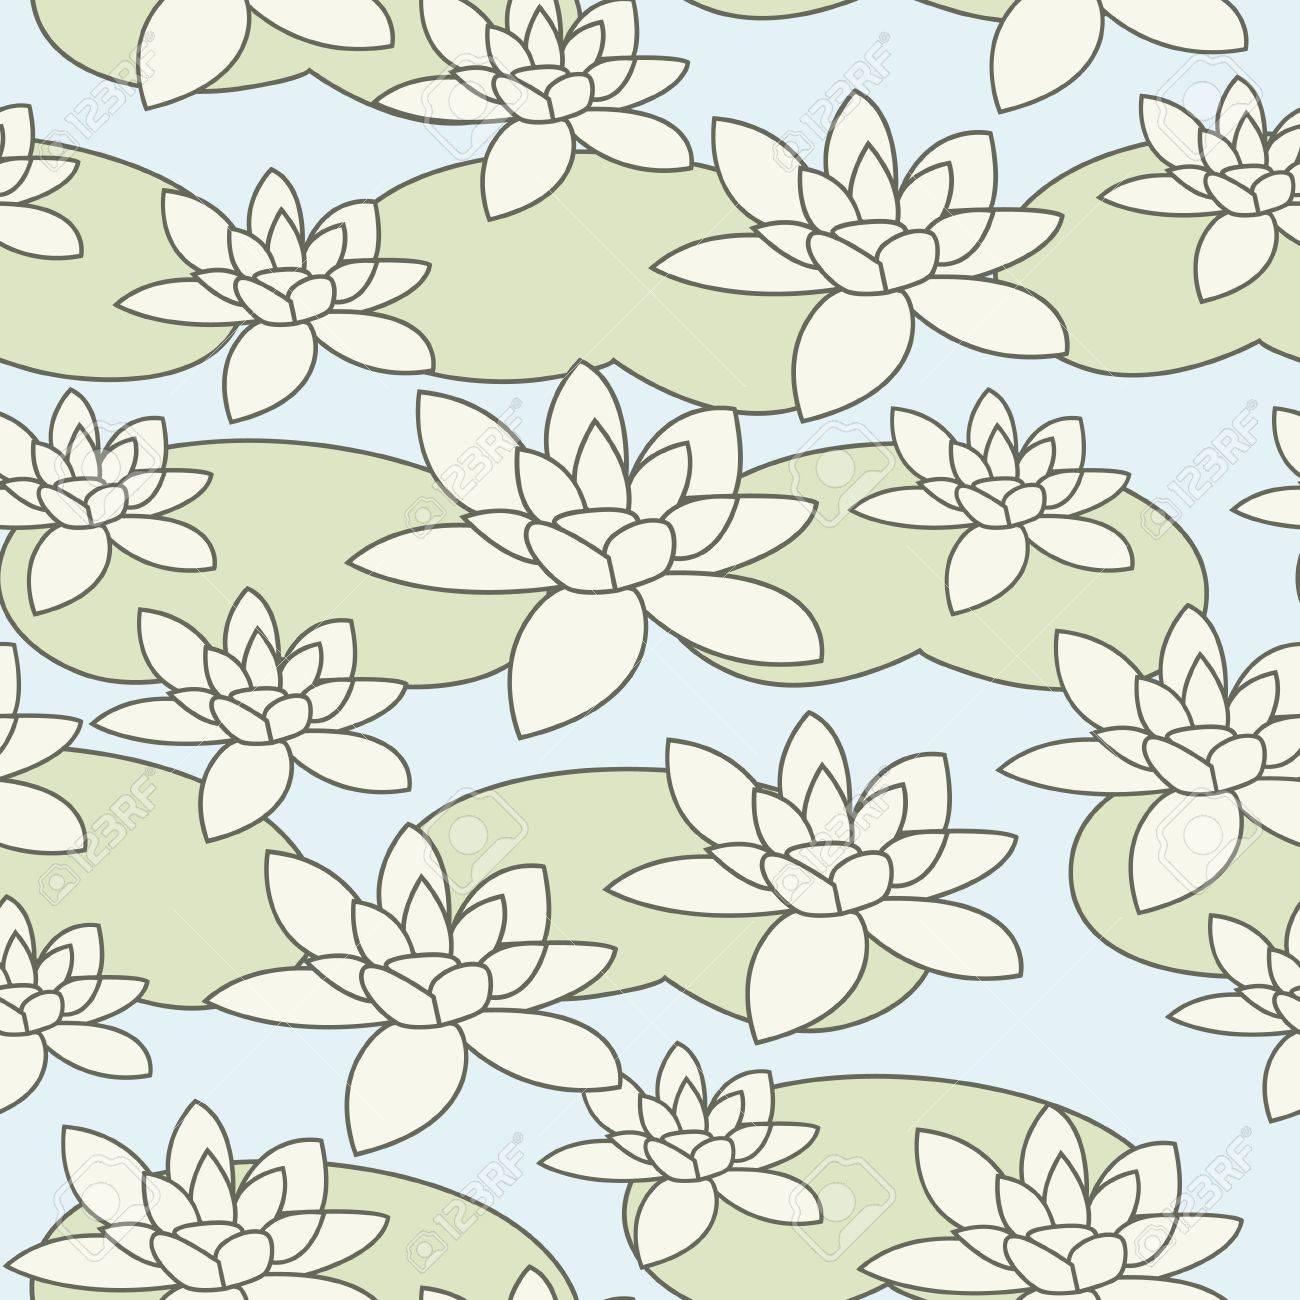 Seamless stylish light water-lily pattern illustration Stock Vector - 16556474